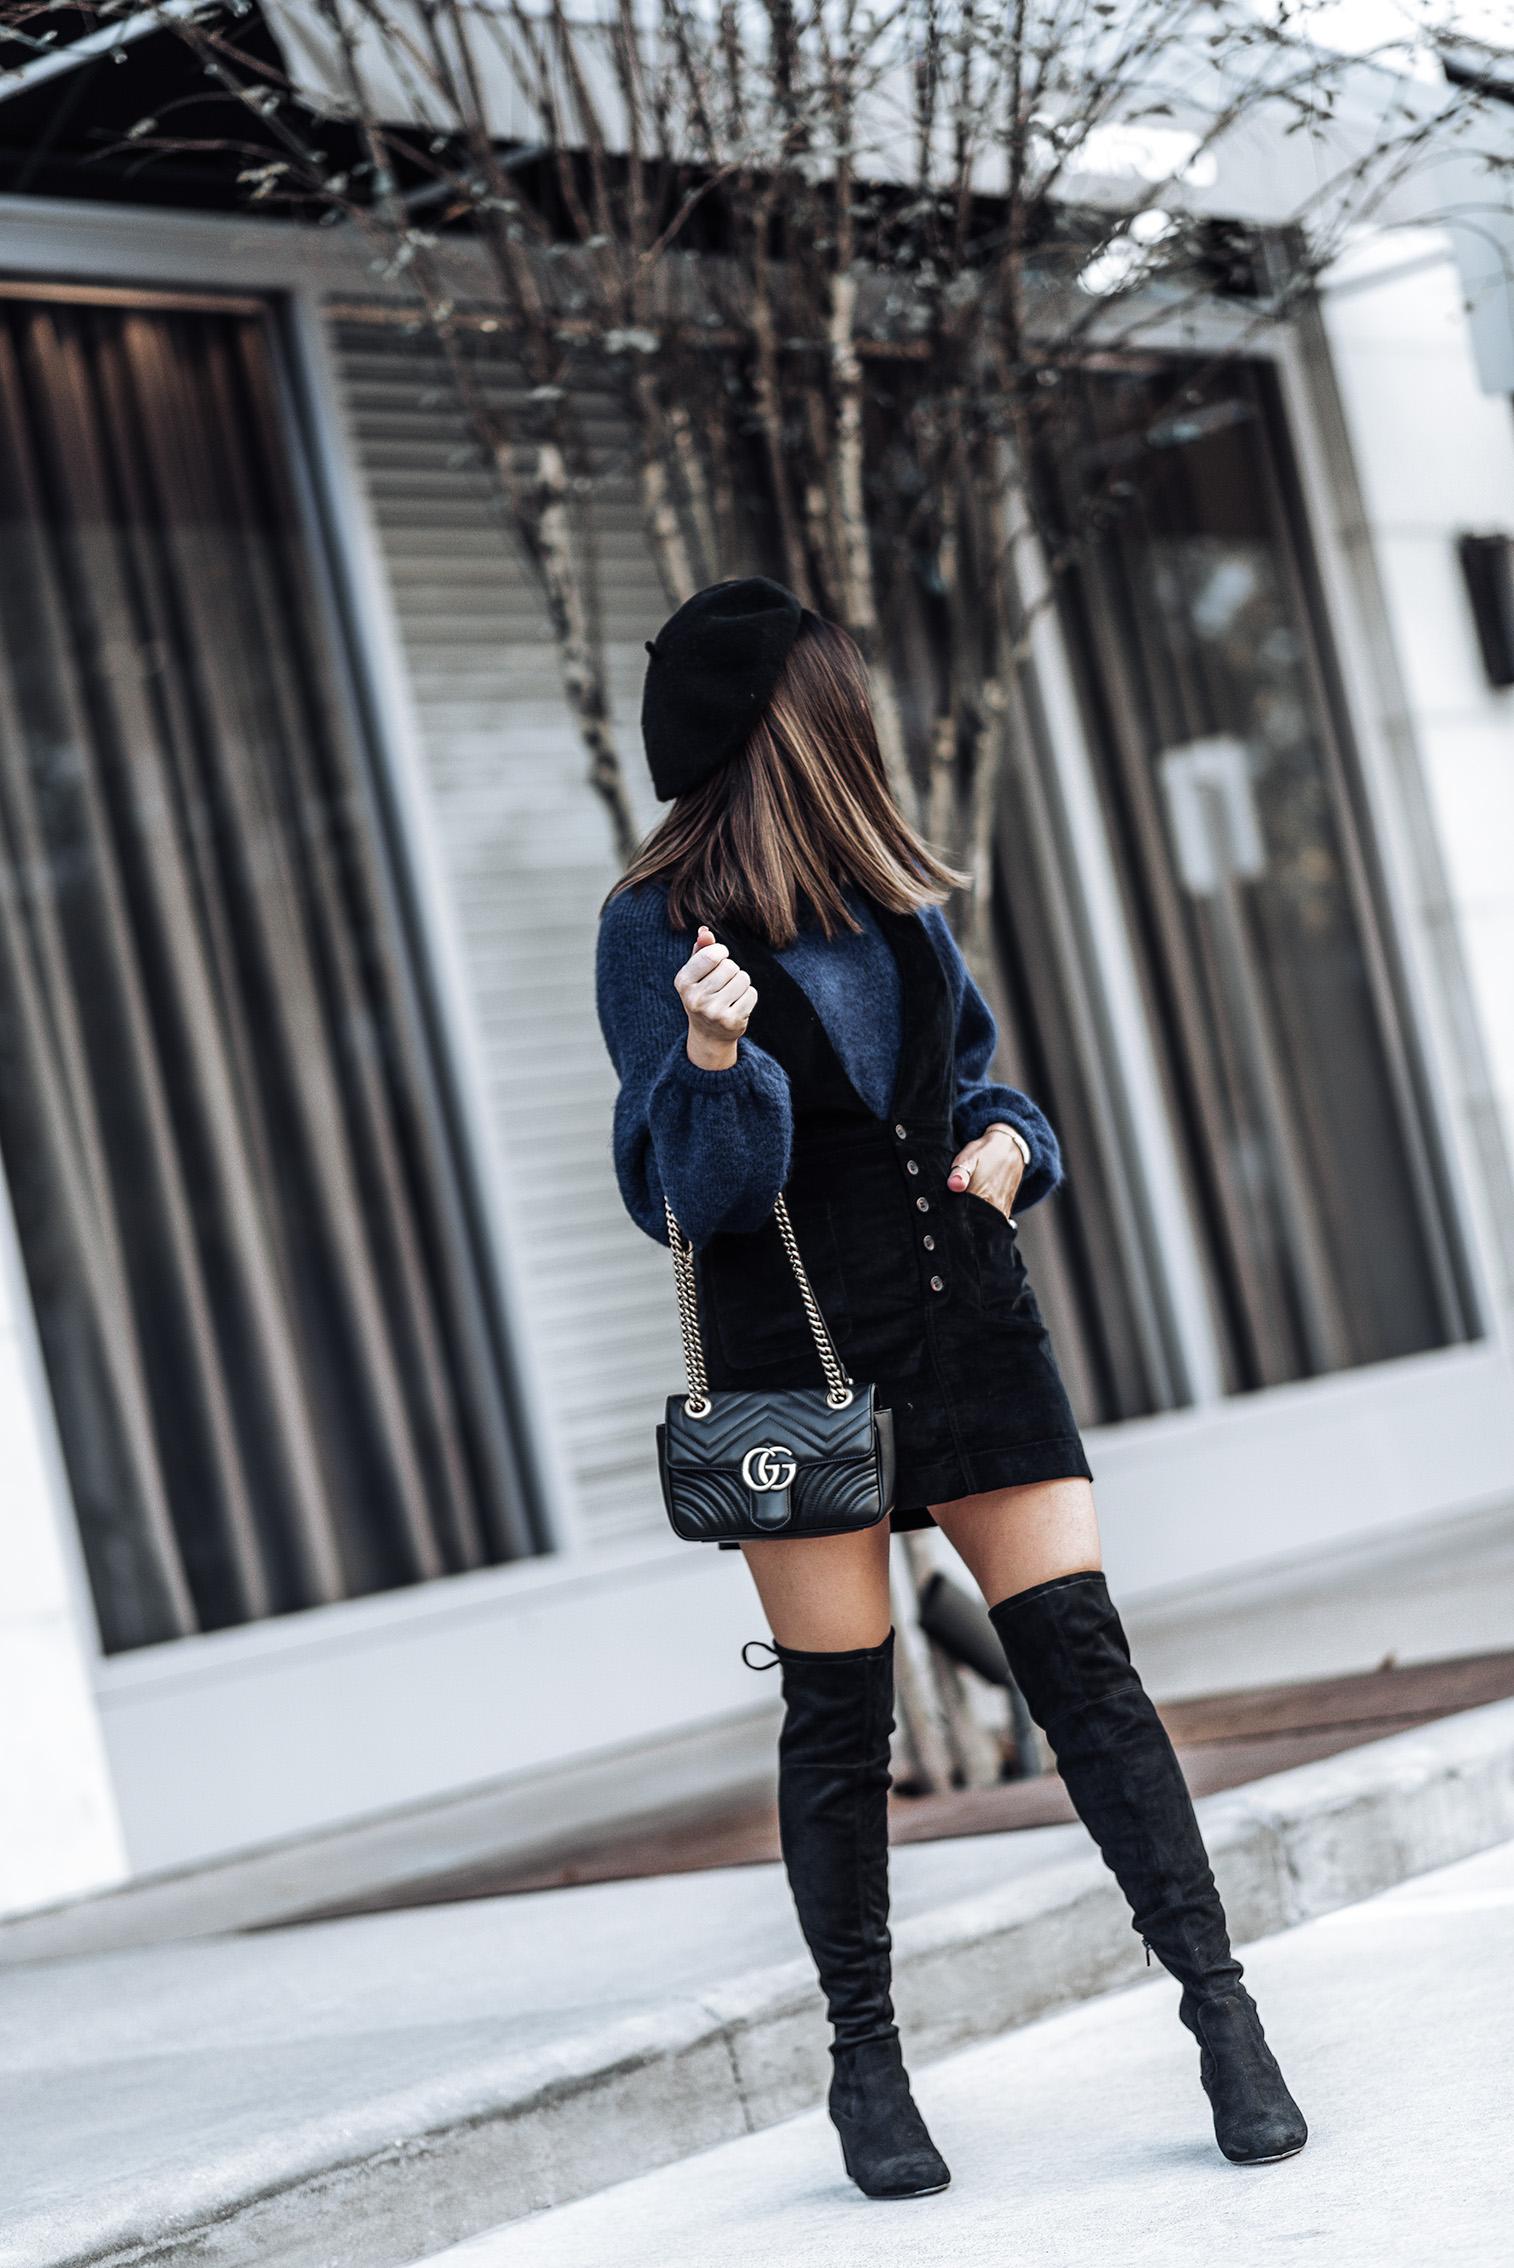 Free People Old School love jumper dress | H&M Sweater | Ivanka Trump Pelinda Over the Knee Boots | Black Wool Beret | #falloutfits #pinaforedress #overthekneebootsoutfits